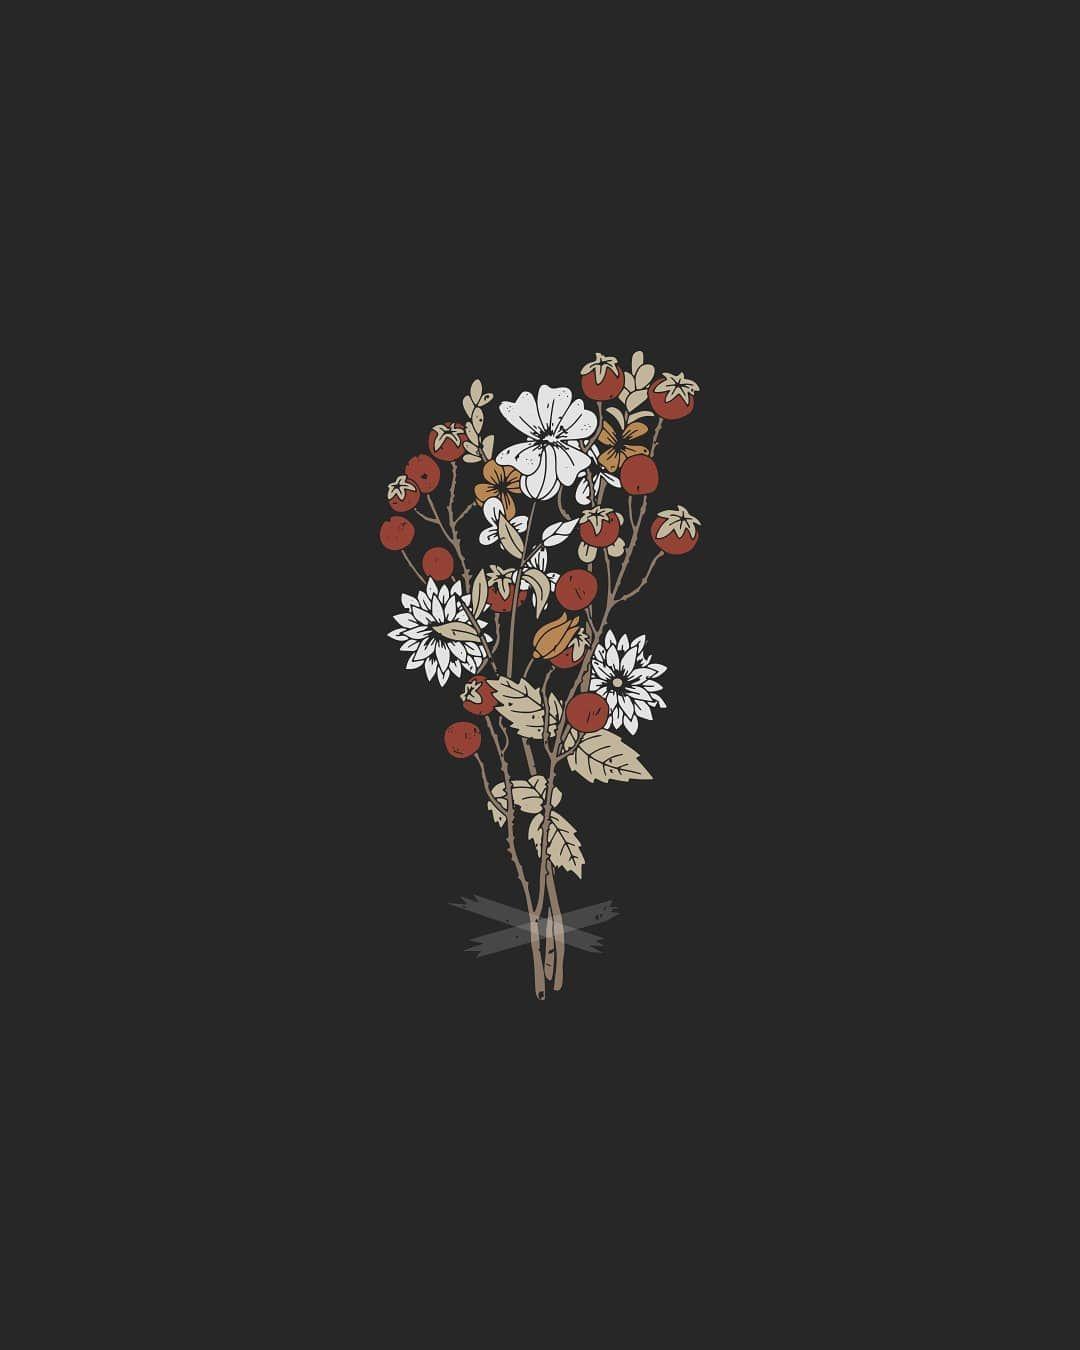 Aesthetic Flower Art Wallpapers Top Free Aesthetic Flower Art Backgrounds Wallpaperaccess